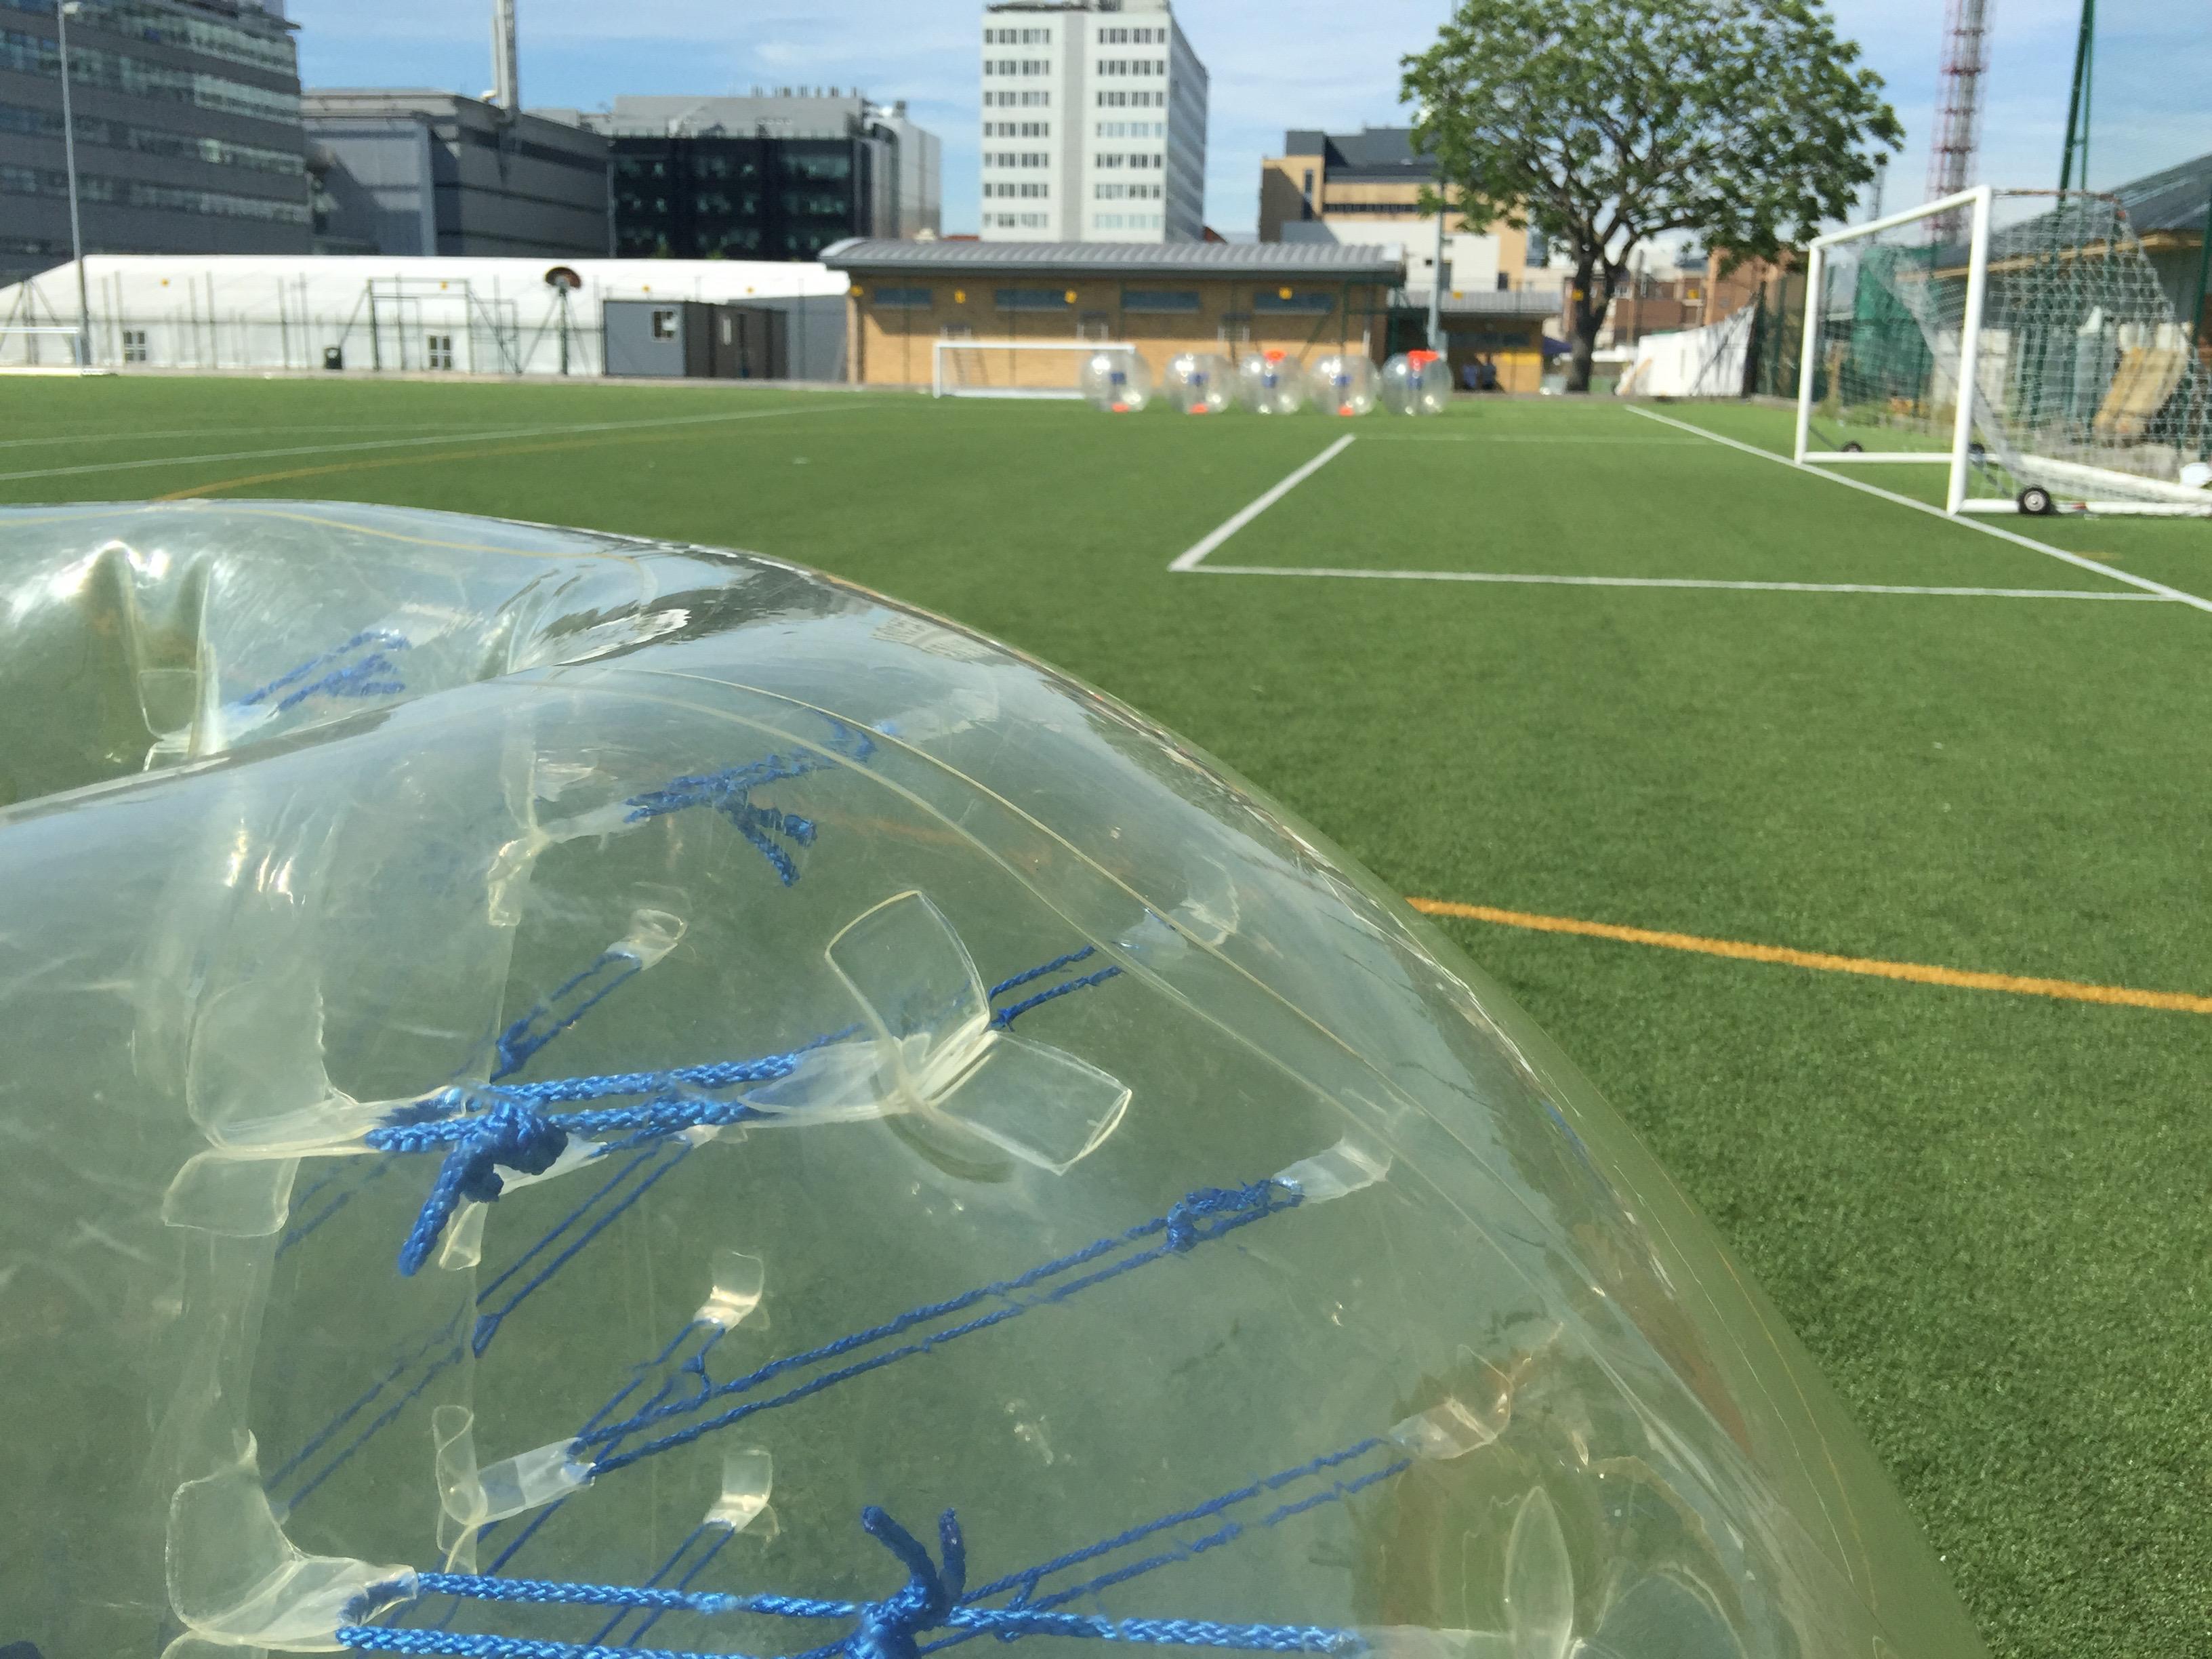 Bubble Football WhiteCity London